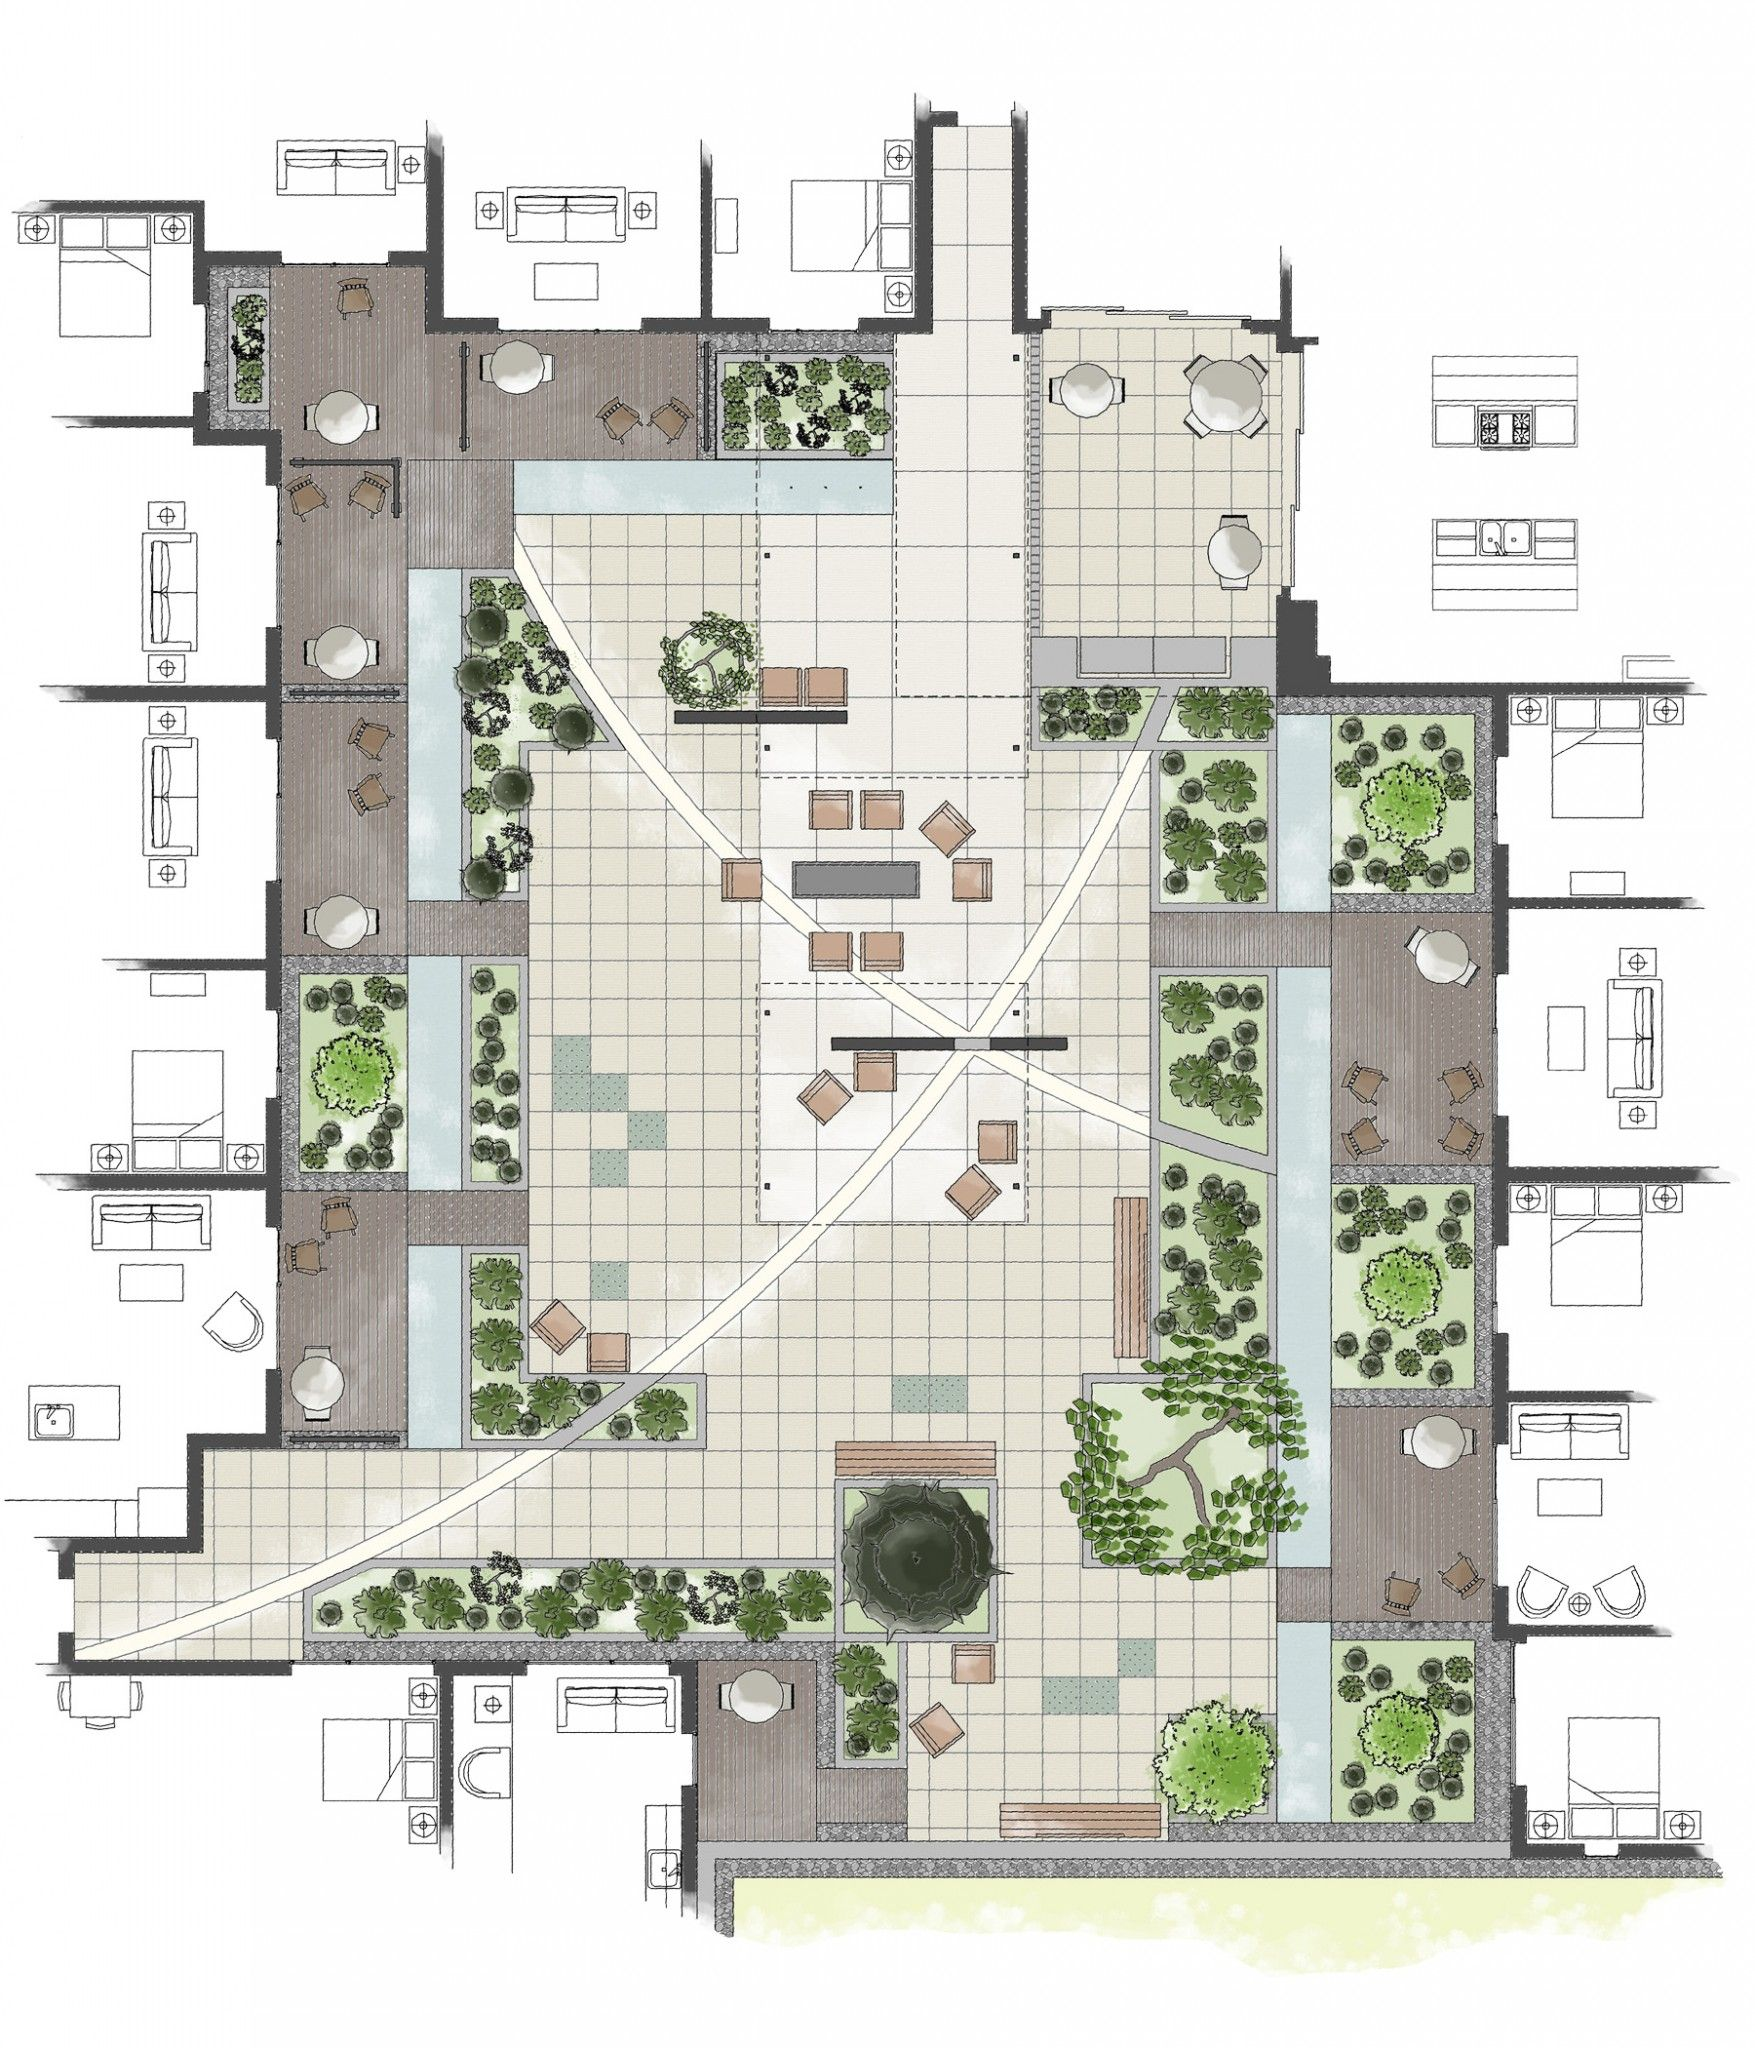 Intensive Residential Green Roof: Rendered Roof Garden ...